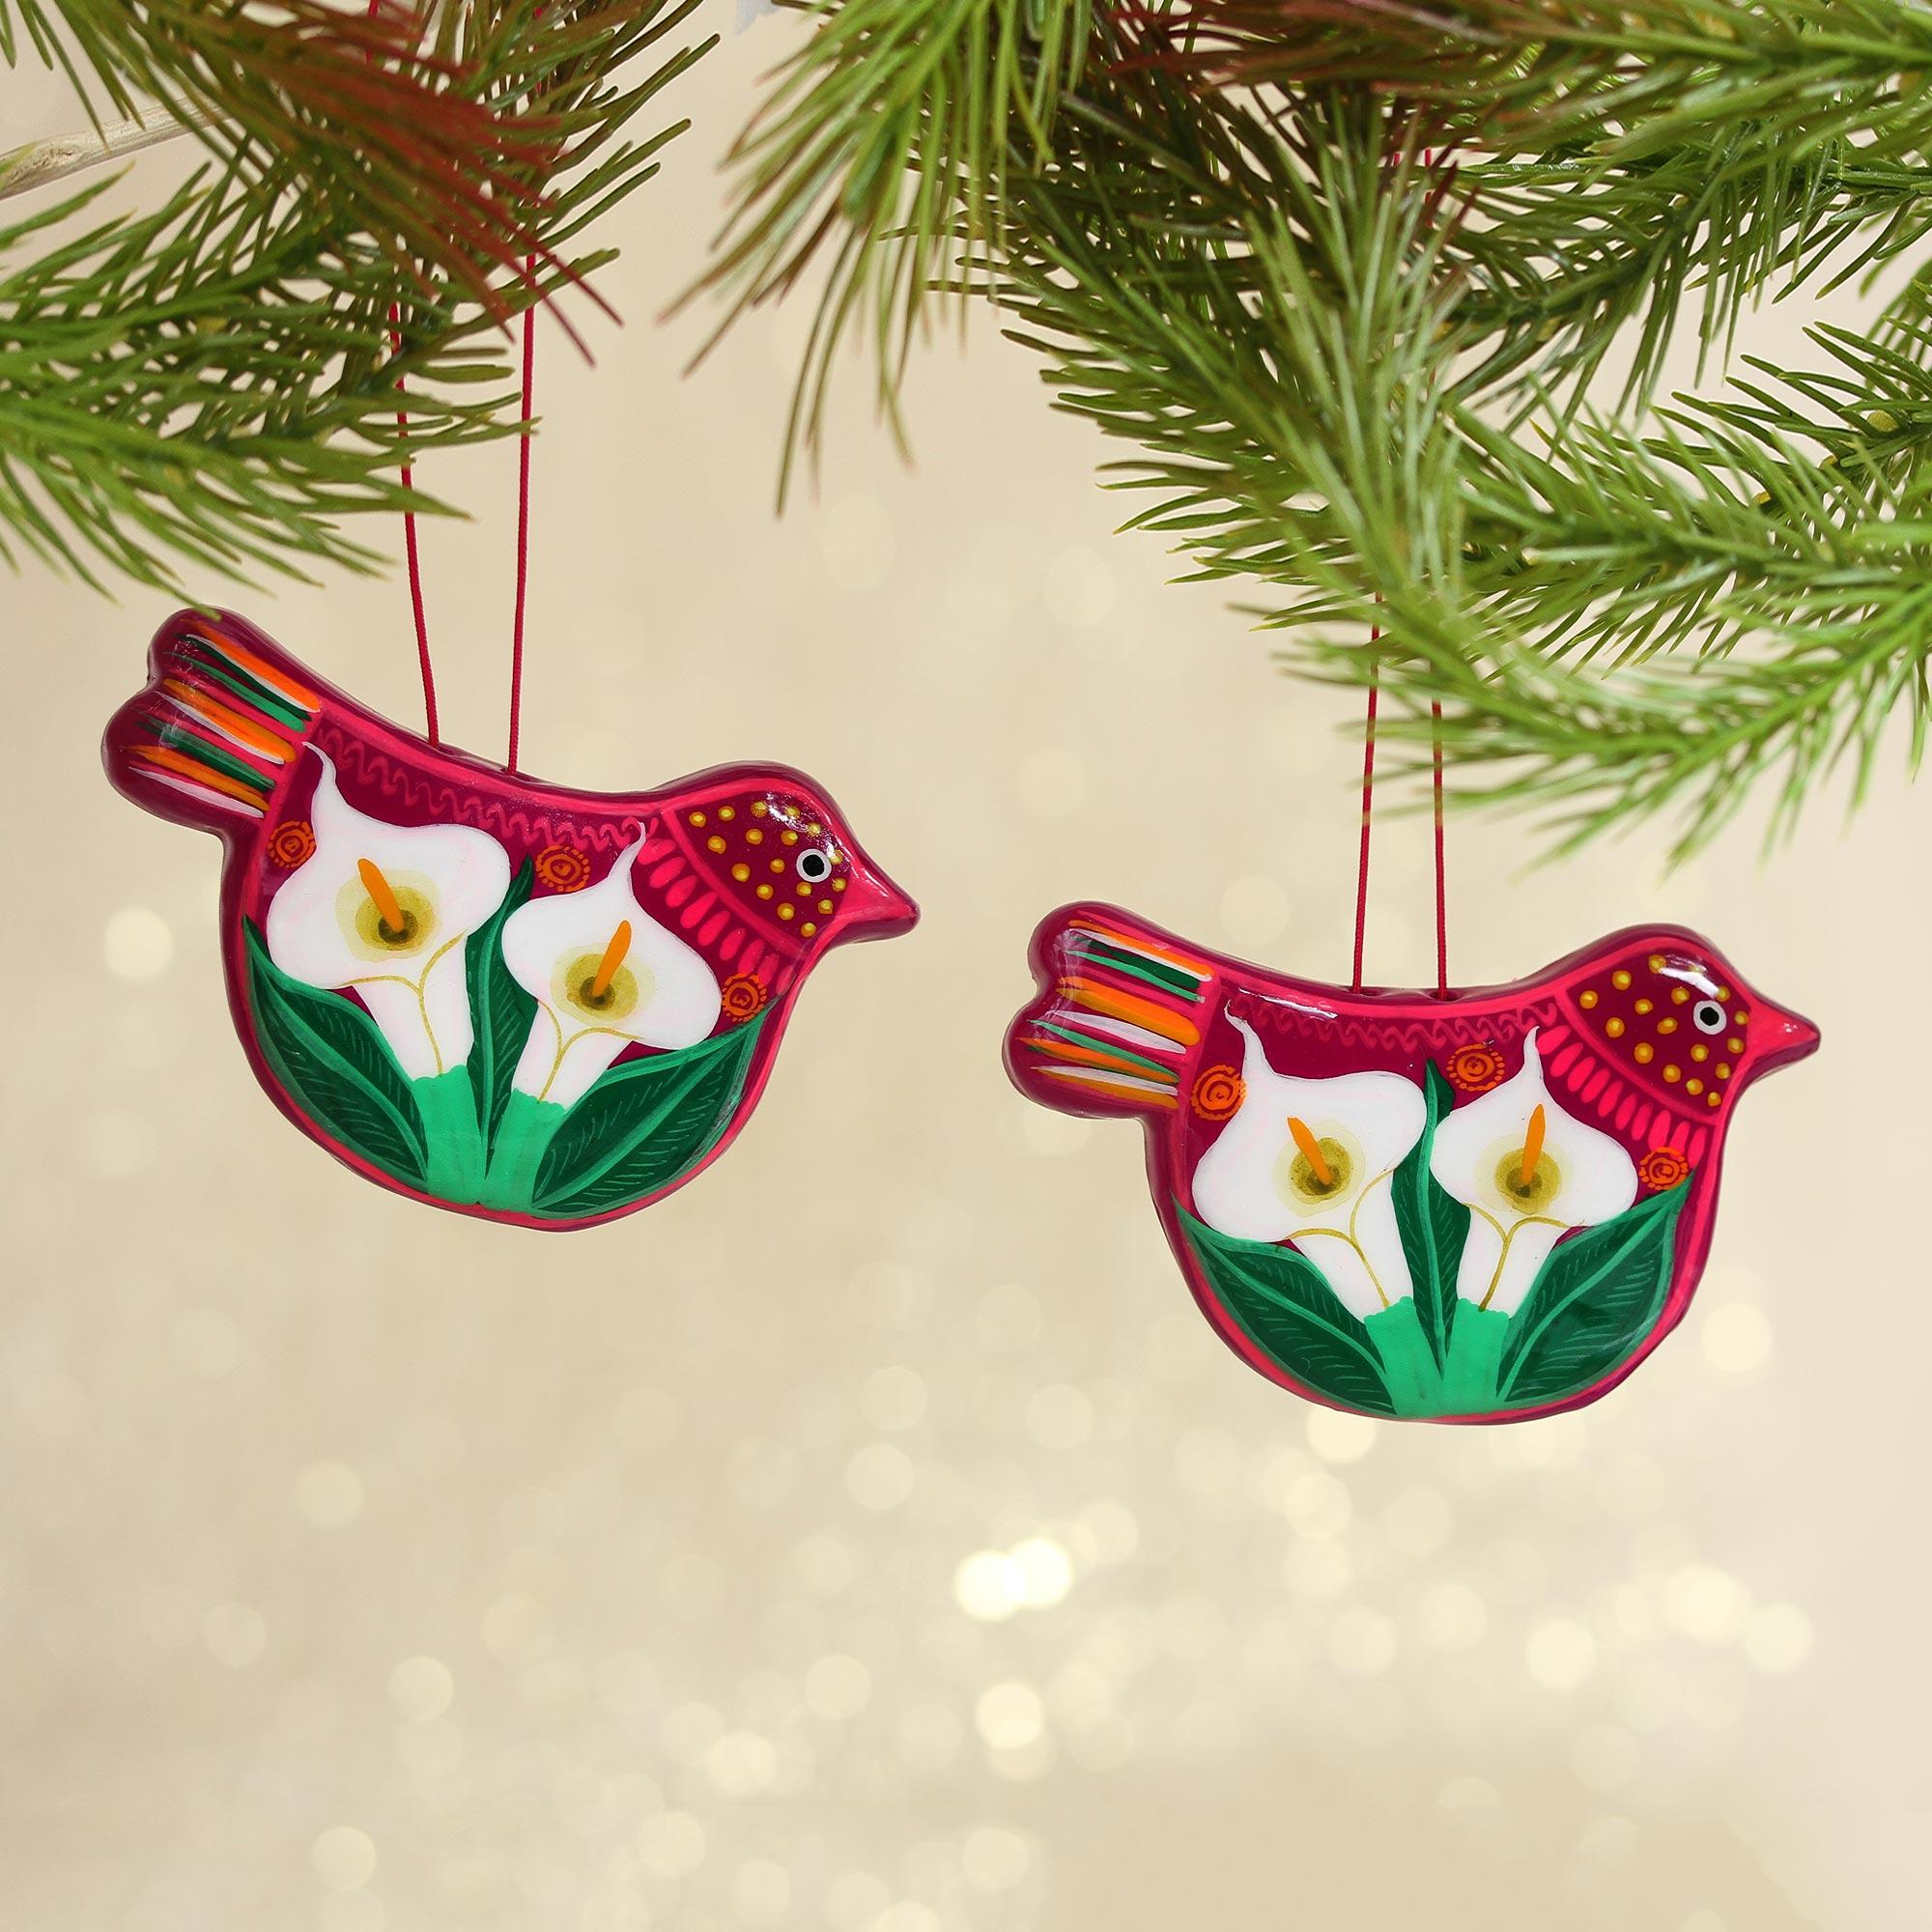 Handcrafted Fuchsia Ceramic Peace Dove Ornaments Pair Bright Bird Joy